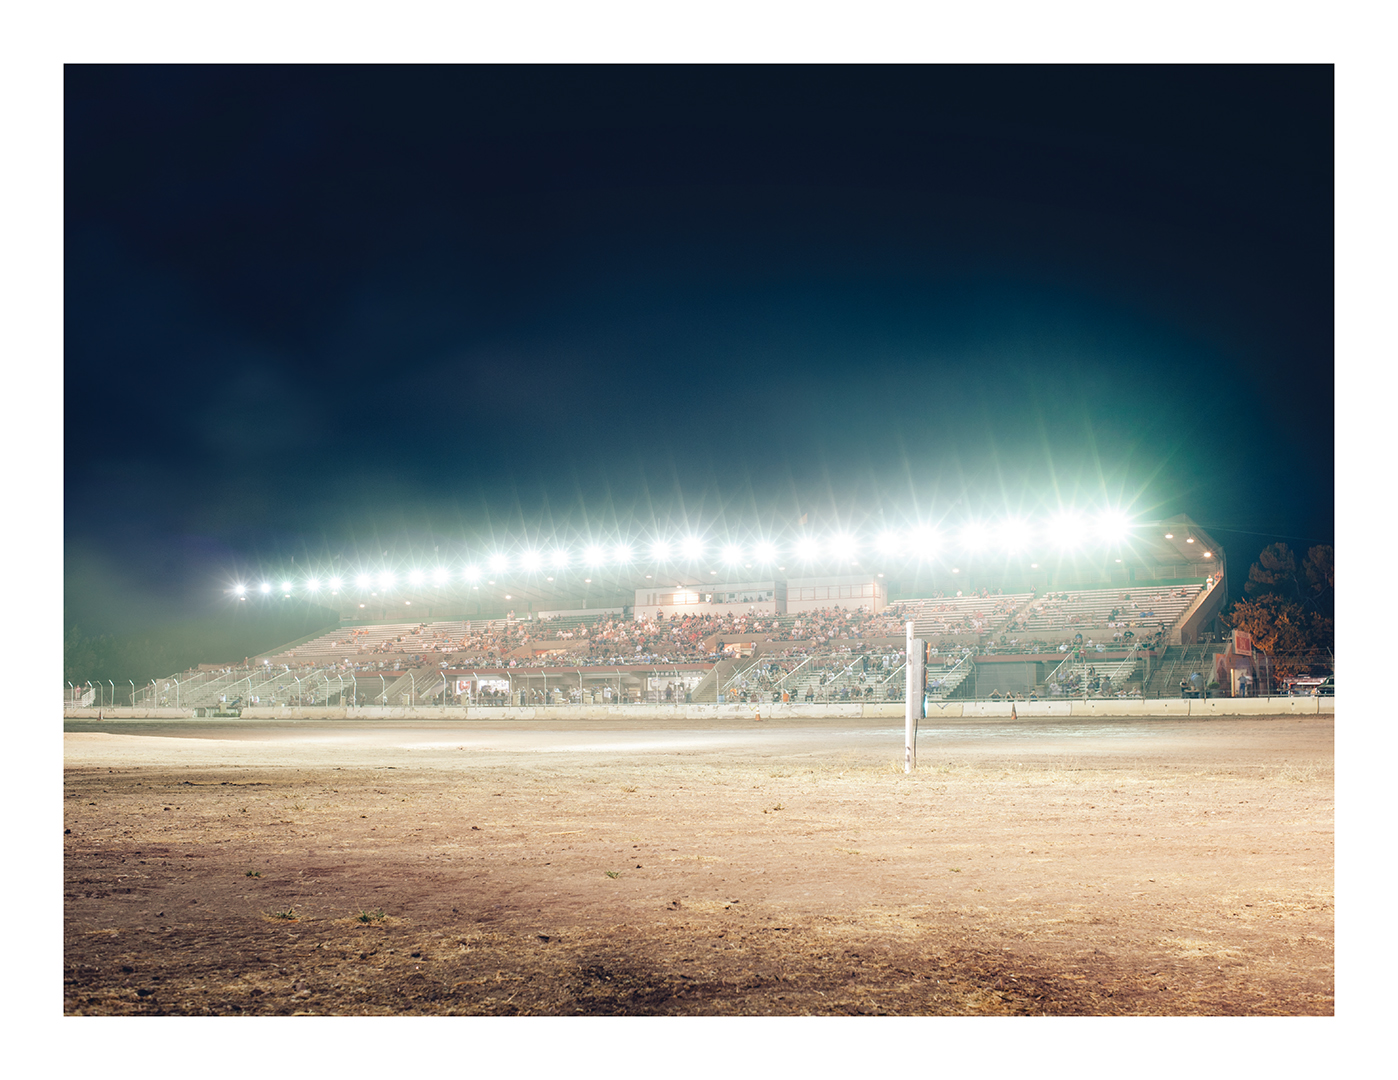 Stockton Dirt Track, Stockton, CA